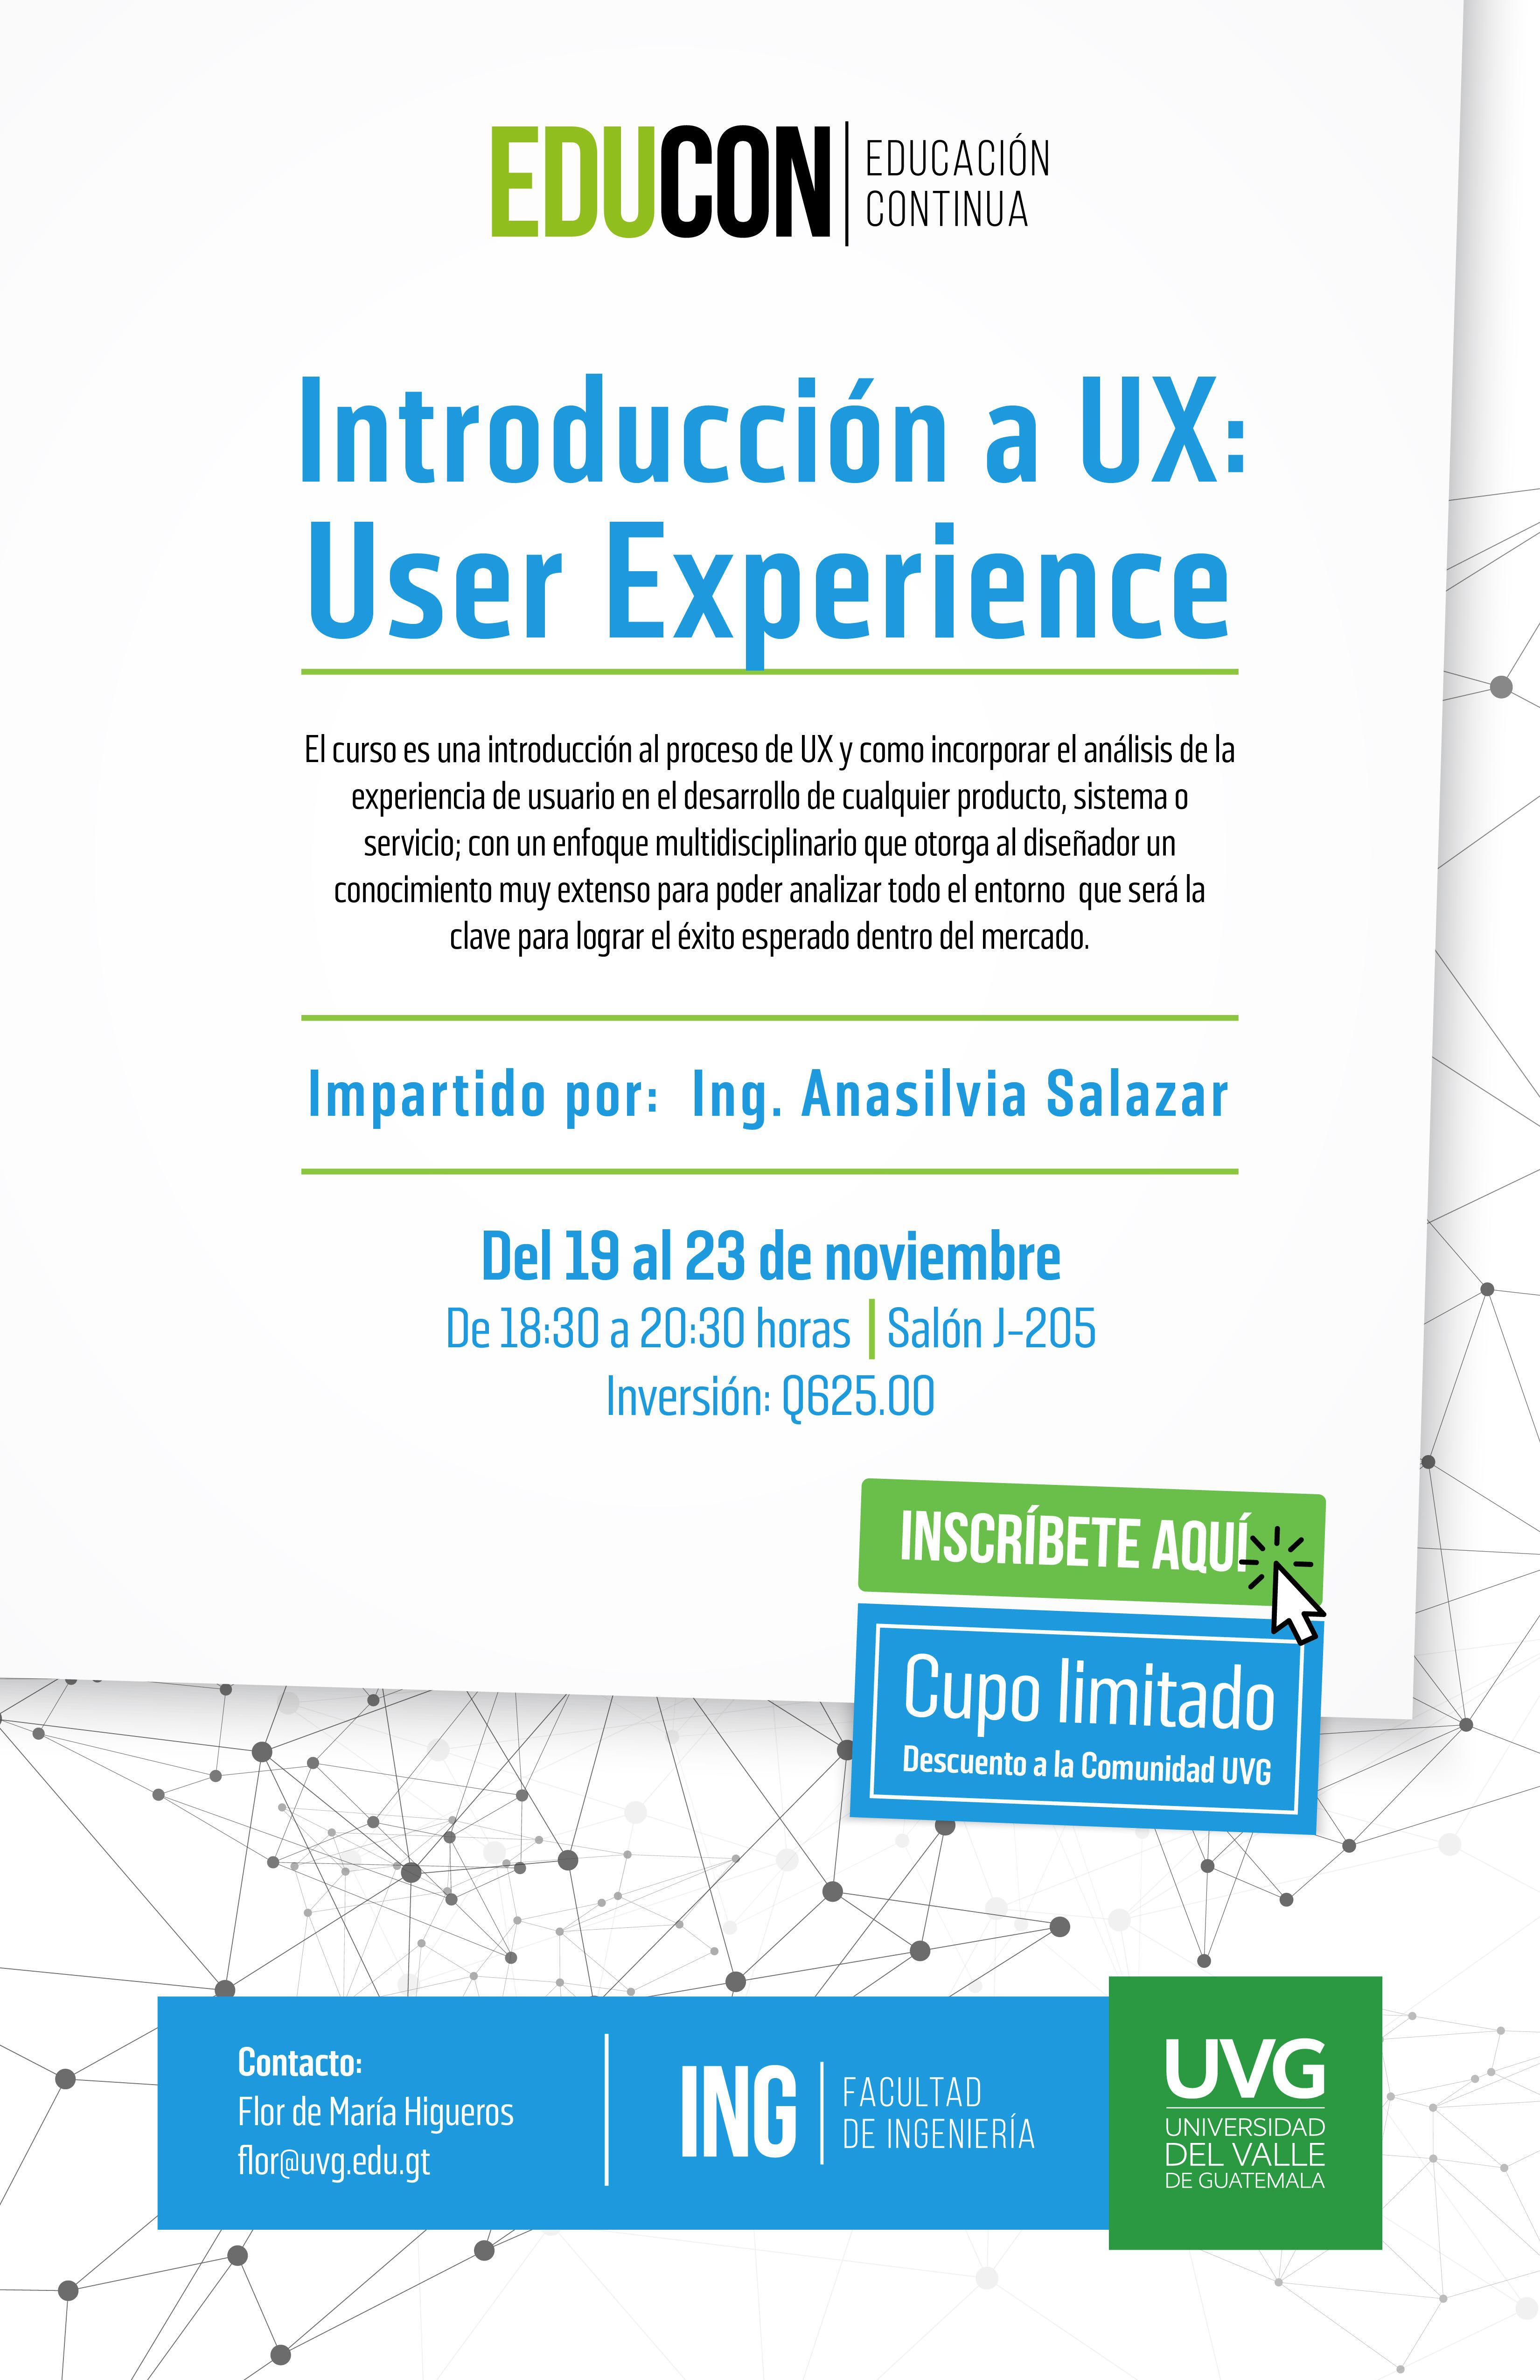 Introducción a UX: User Experience